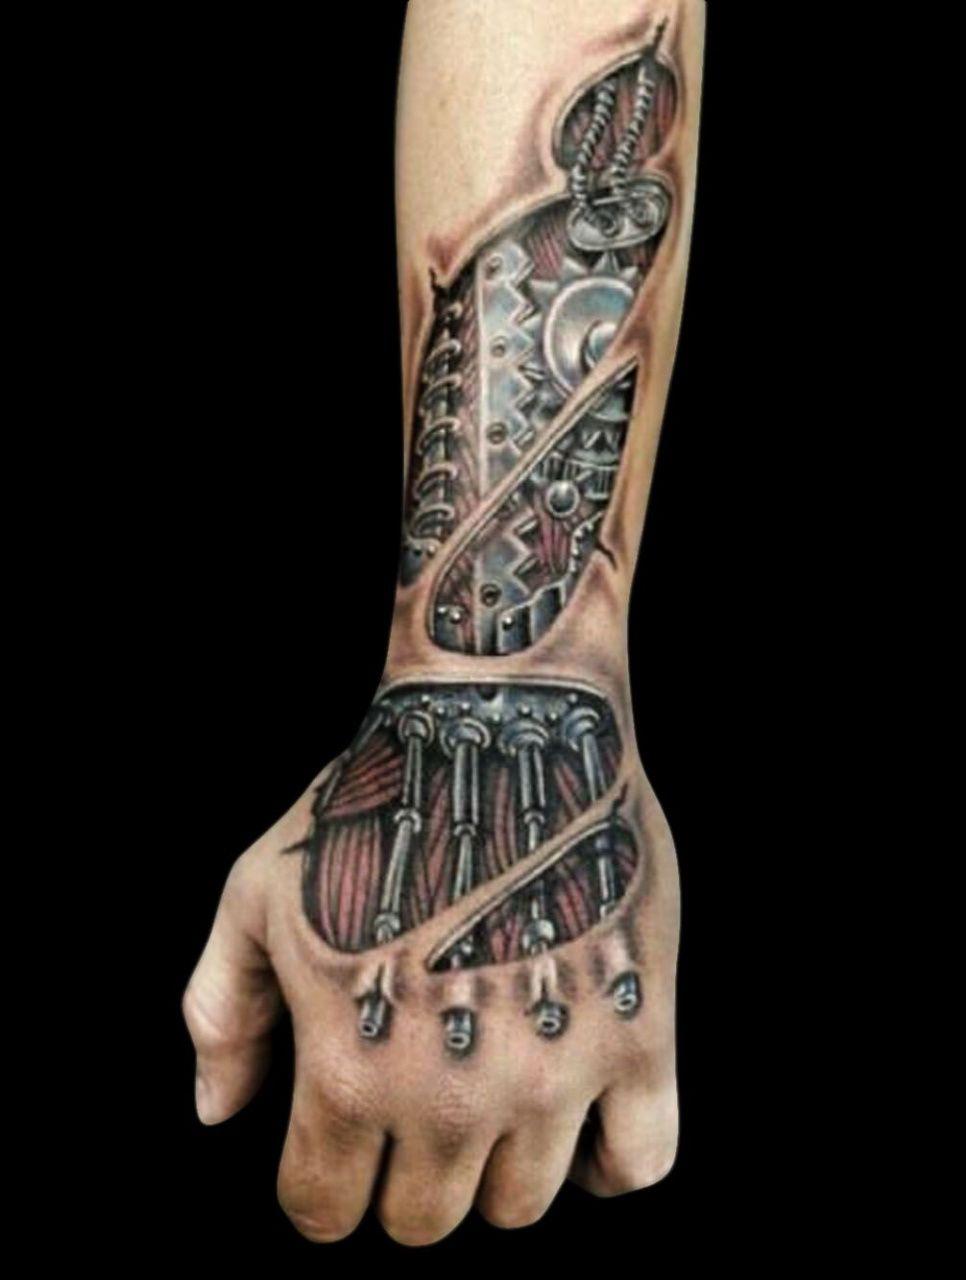 Evil3d Hand Tattoos In 2020 Biomechanical Tattoo Hand Tattoos Hand Tattoo Images